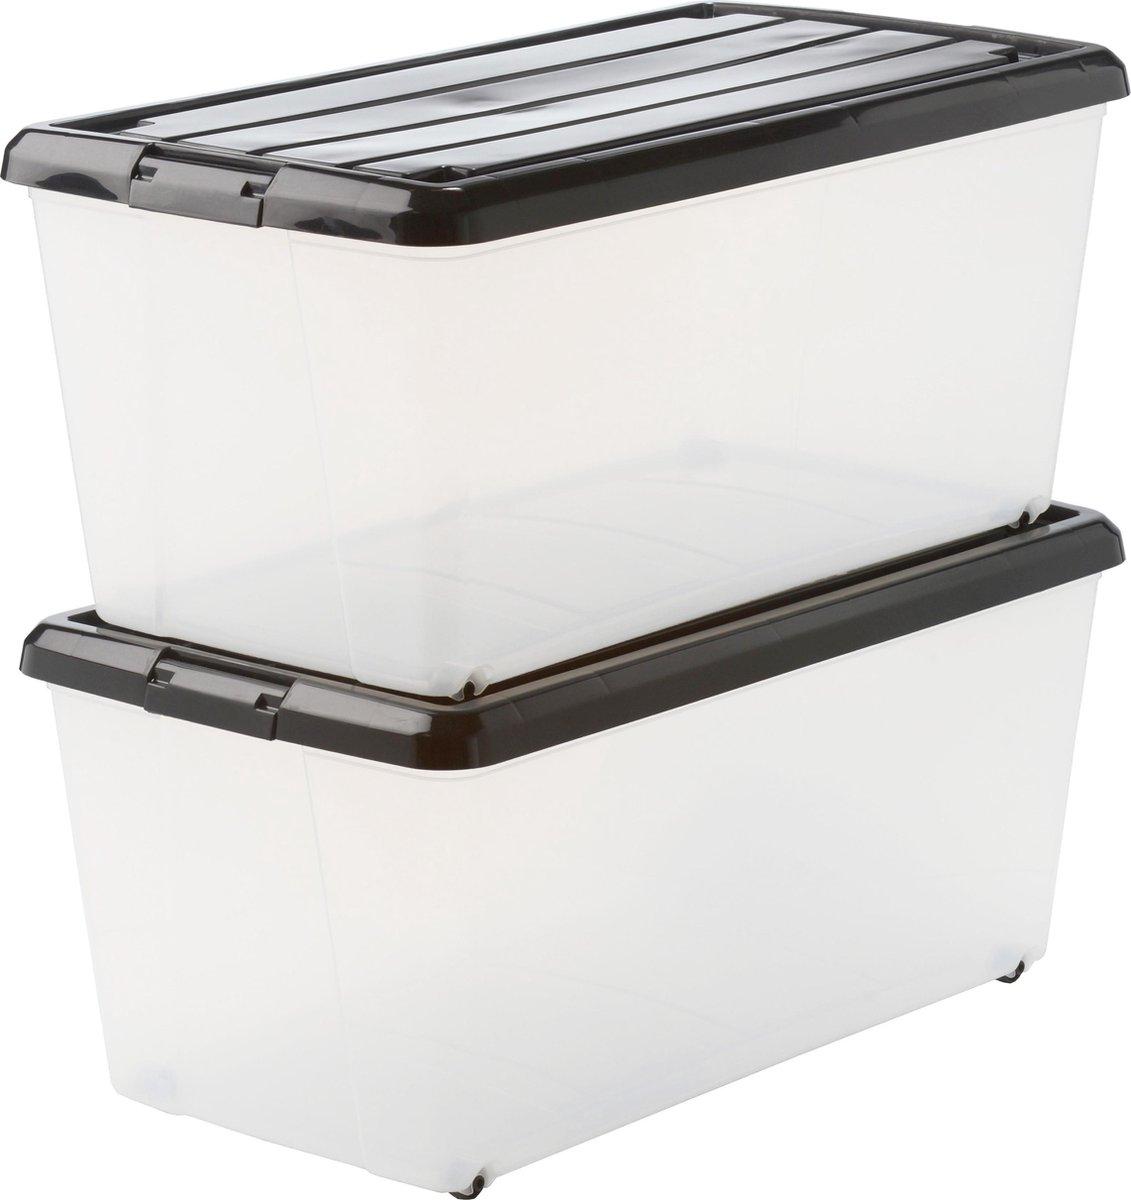 IRIS Rollerbox Opbergbox - 70L - 2 Stuks - Transparant/Zwart